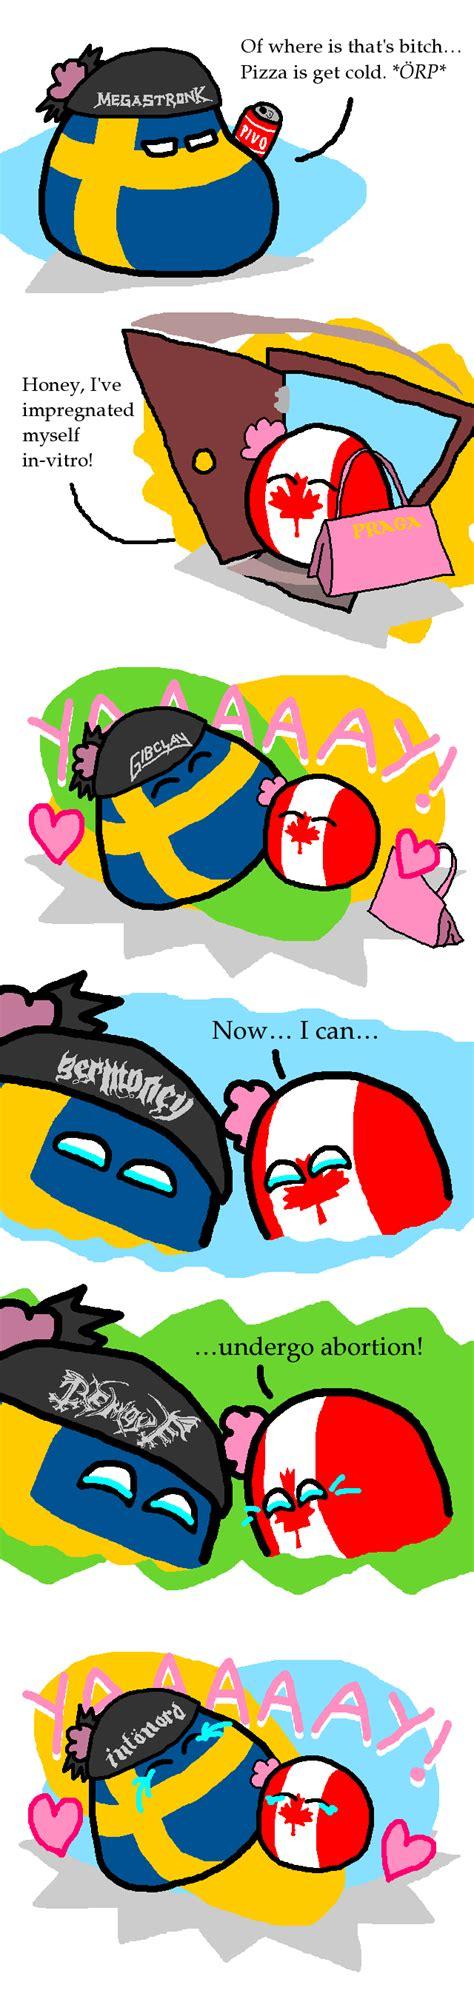 File Lesbians Polandball Png Wikimedia Commons